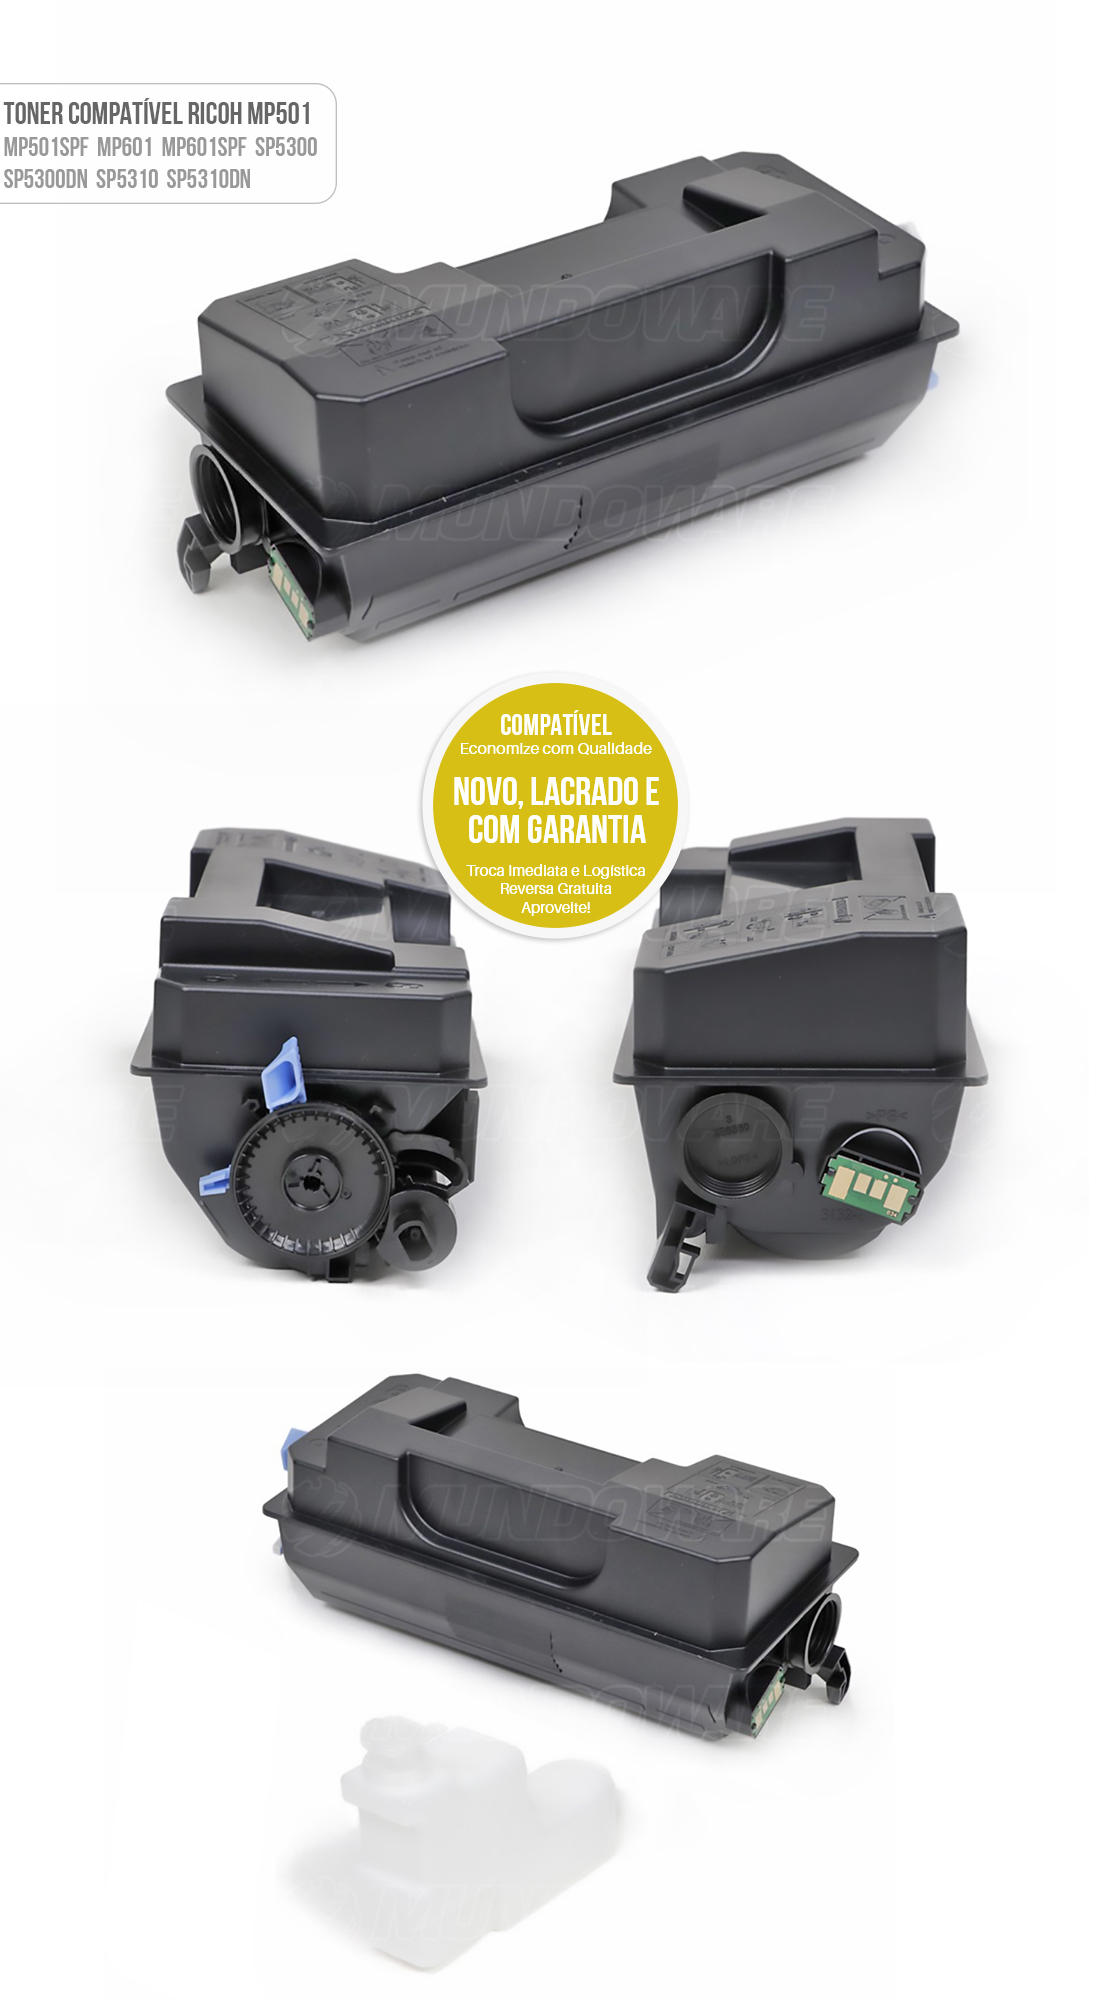 Toner Compatível MP501 para Impressora Ricoh MP501SPF MP601 MP601SPF SP5300 SP5300DN SP5310 SP5310DN Tonner